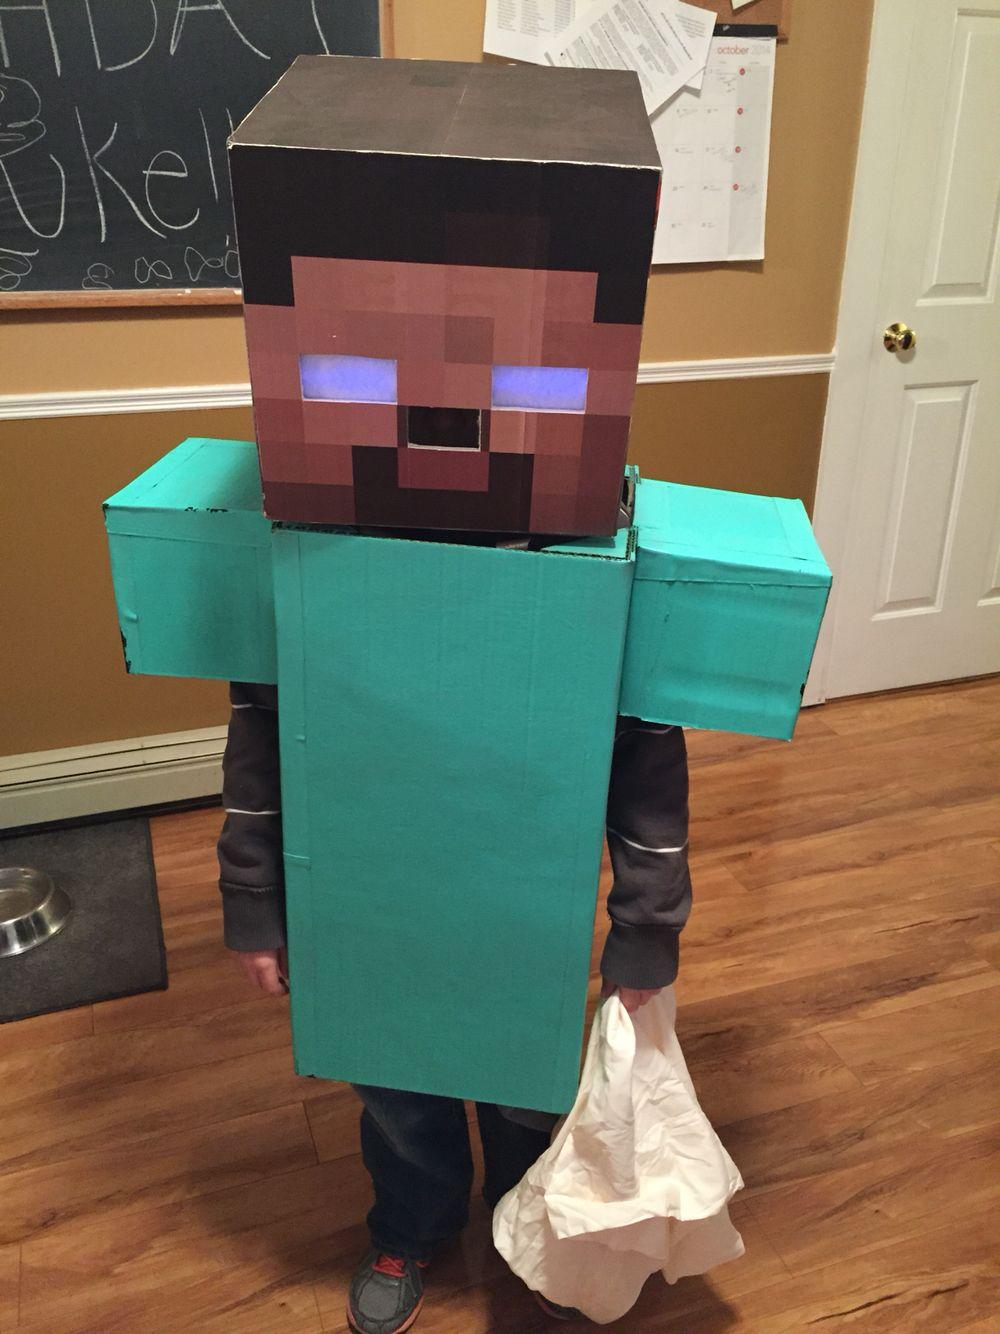 minecraft herobrine costume. eyes light up using glow sticks taped